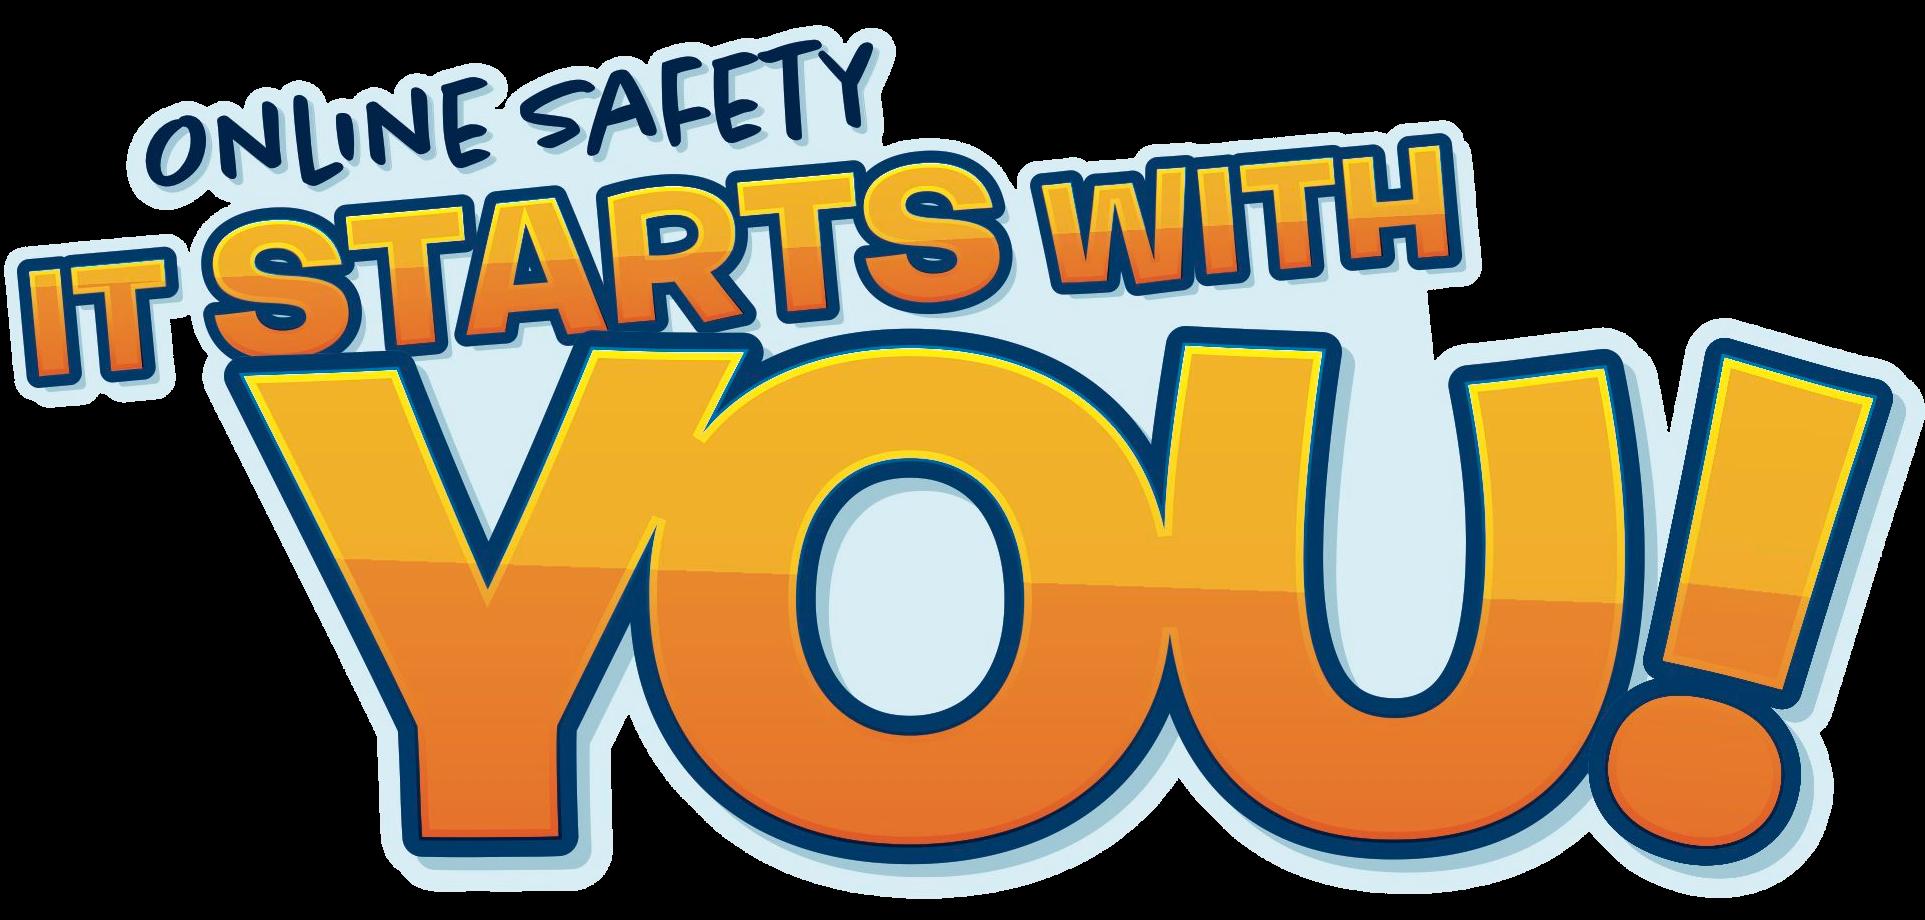 Image quiz logo png. Website clipart internet safety